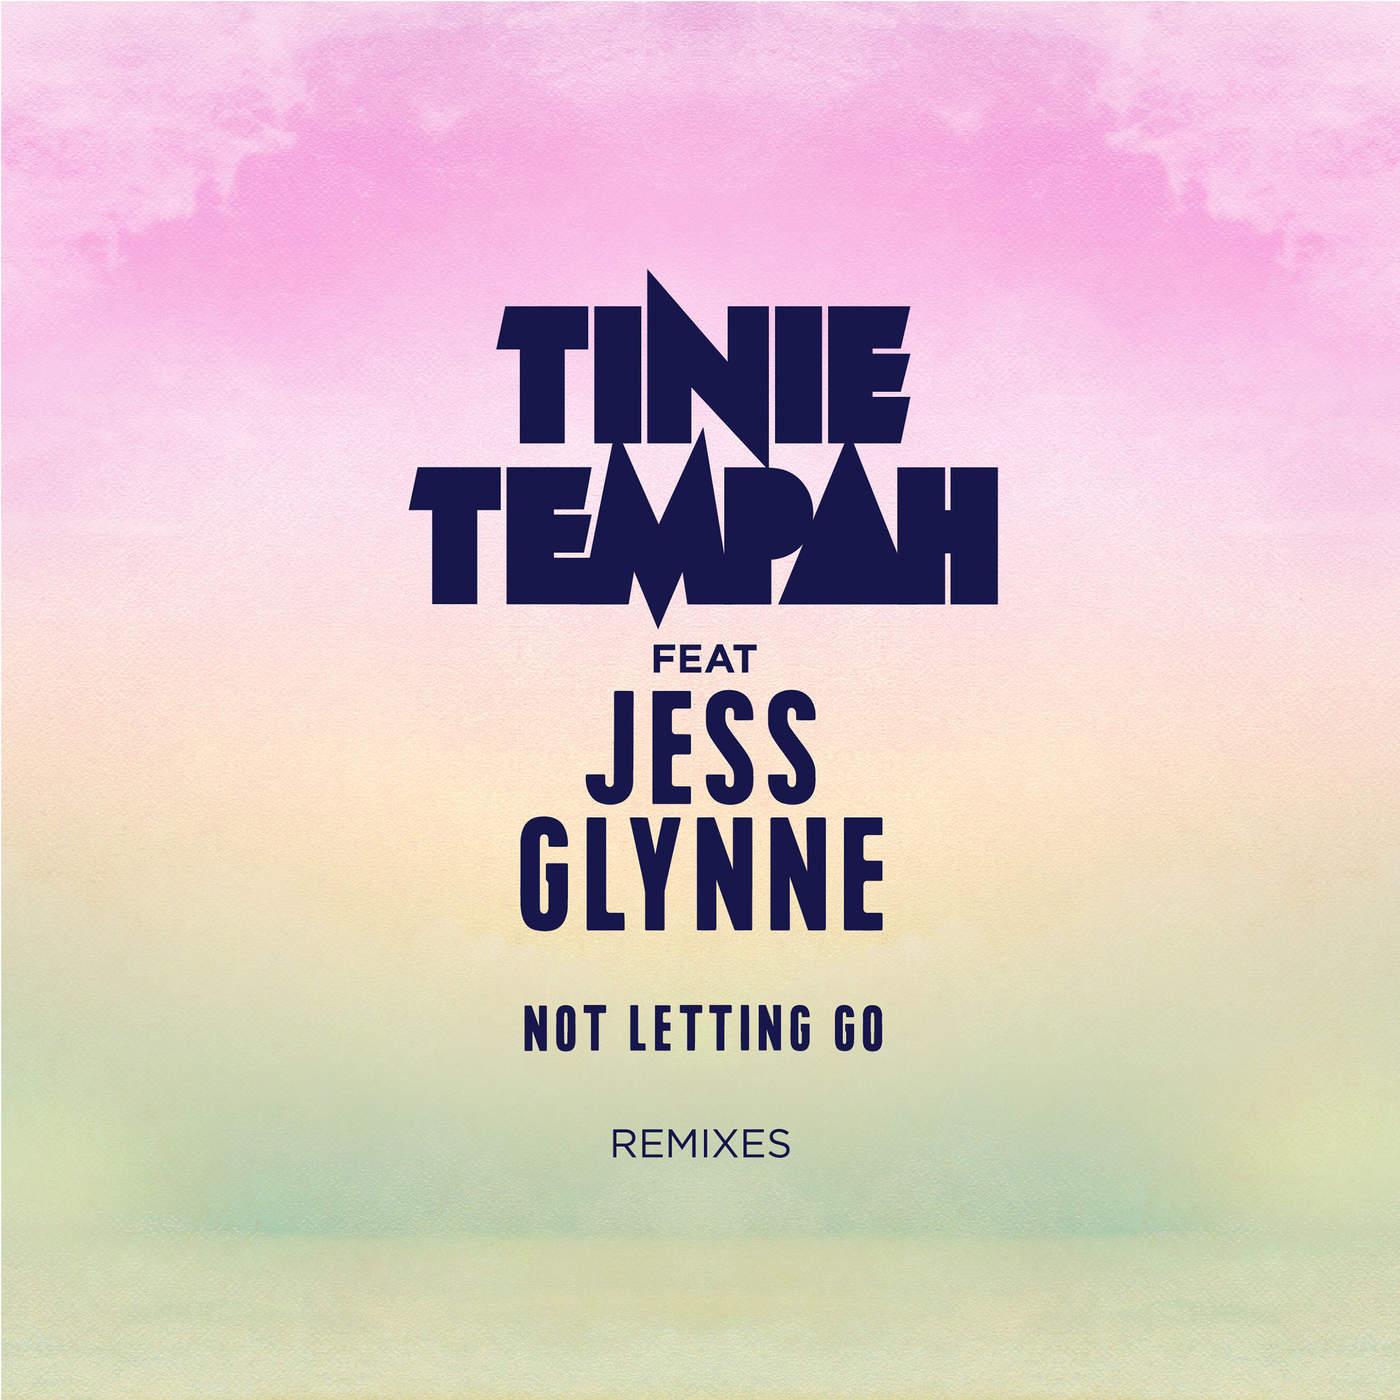 Tinie Tempah Not Letting go Album Cover Tinie Tempah Not Letting go